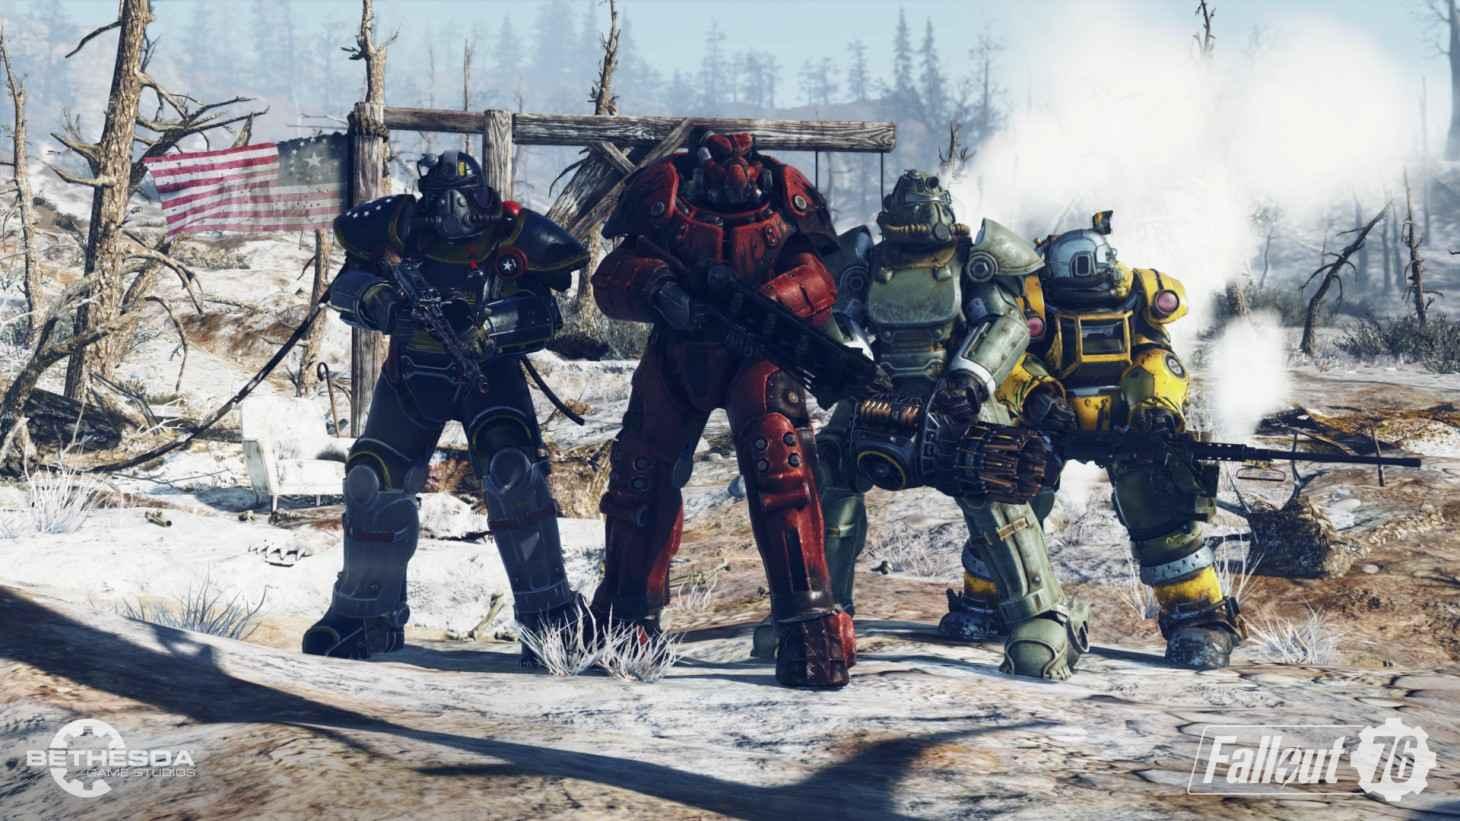 Fallout 76 Beta Release Window Confirmed